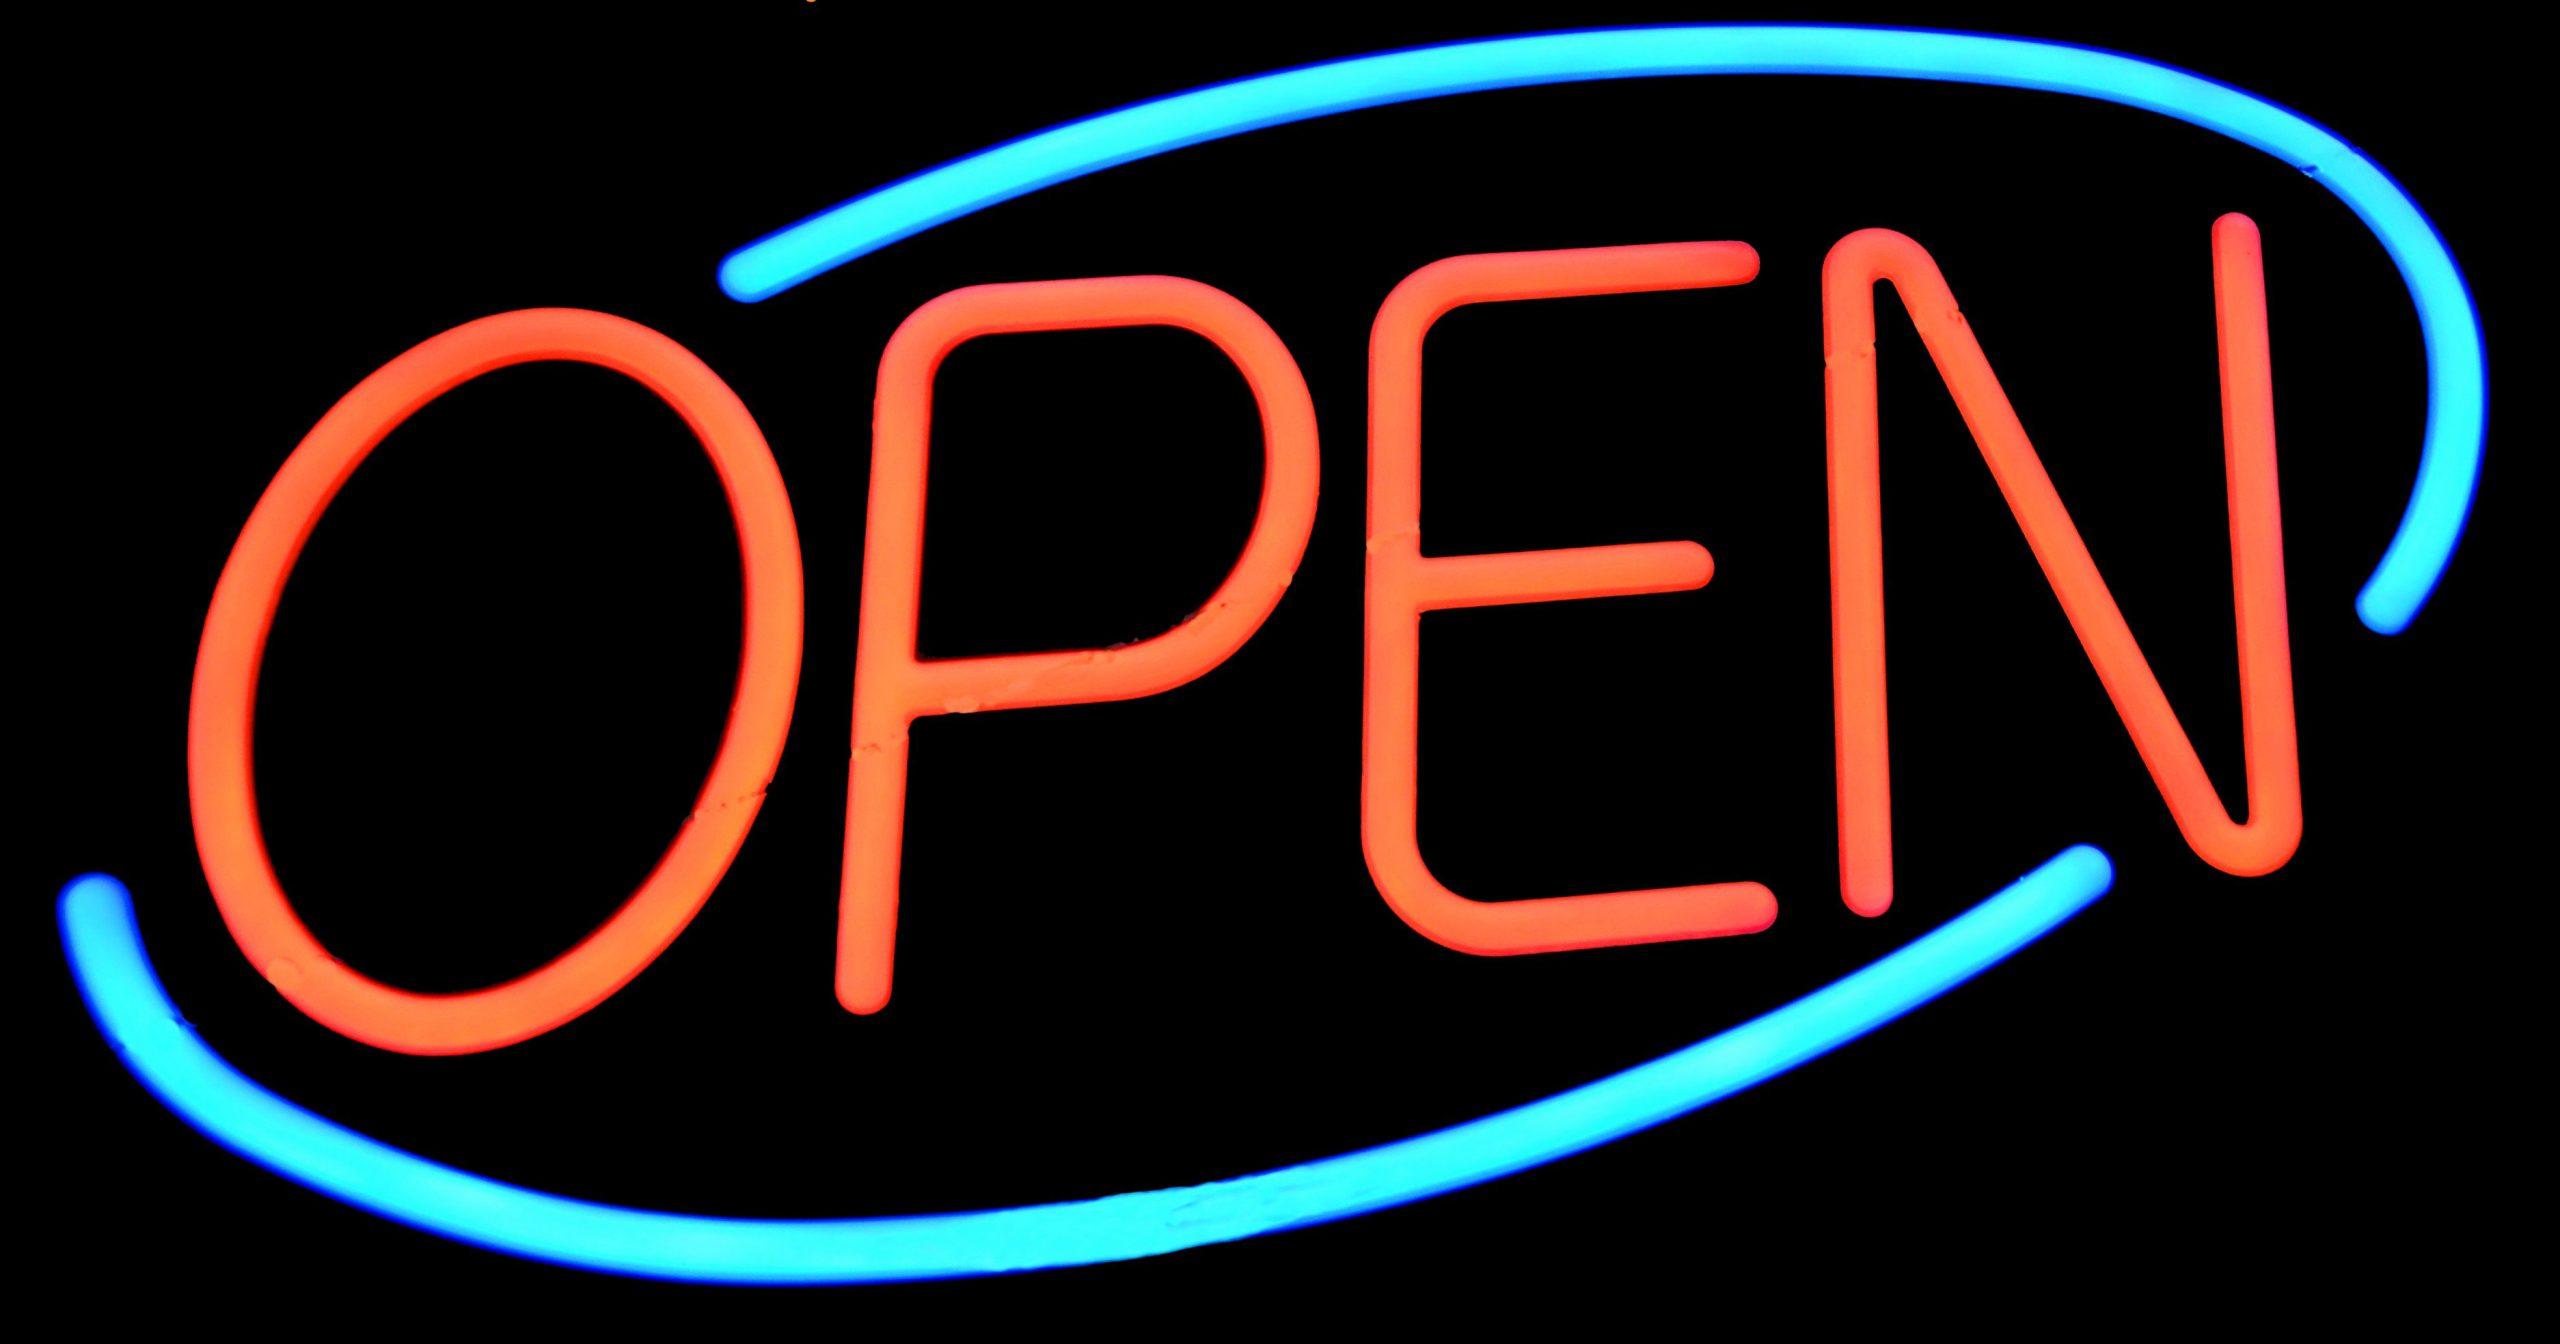 open-light-window-number-advertising-sign-537173-pxhere.com